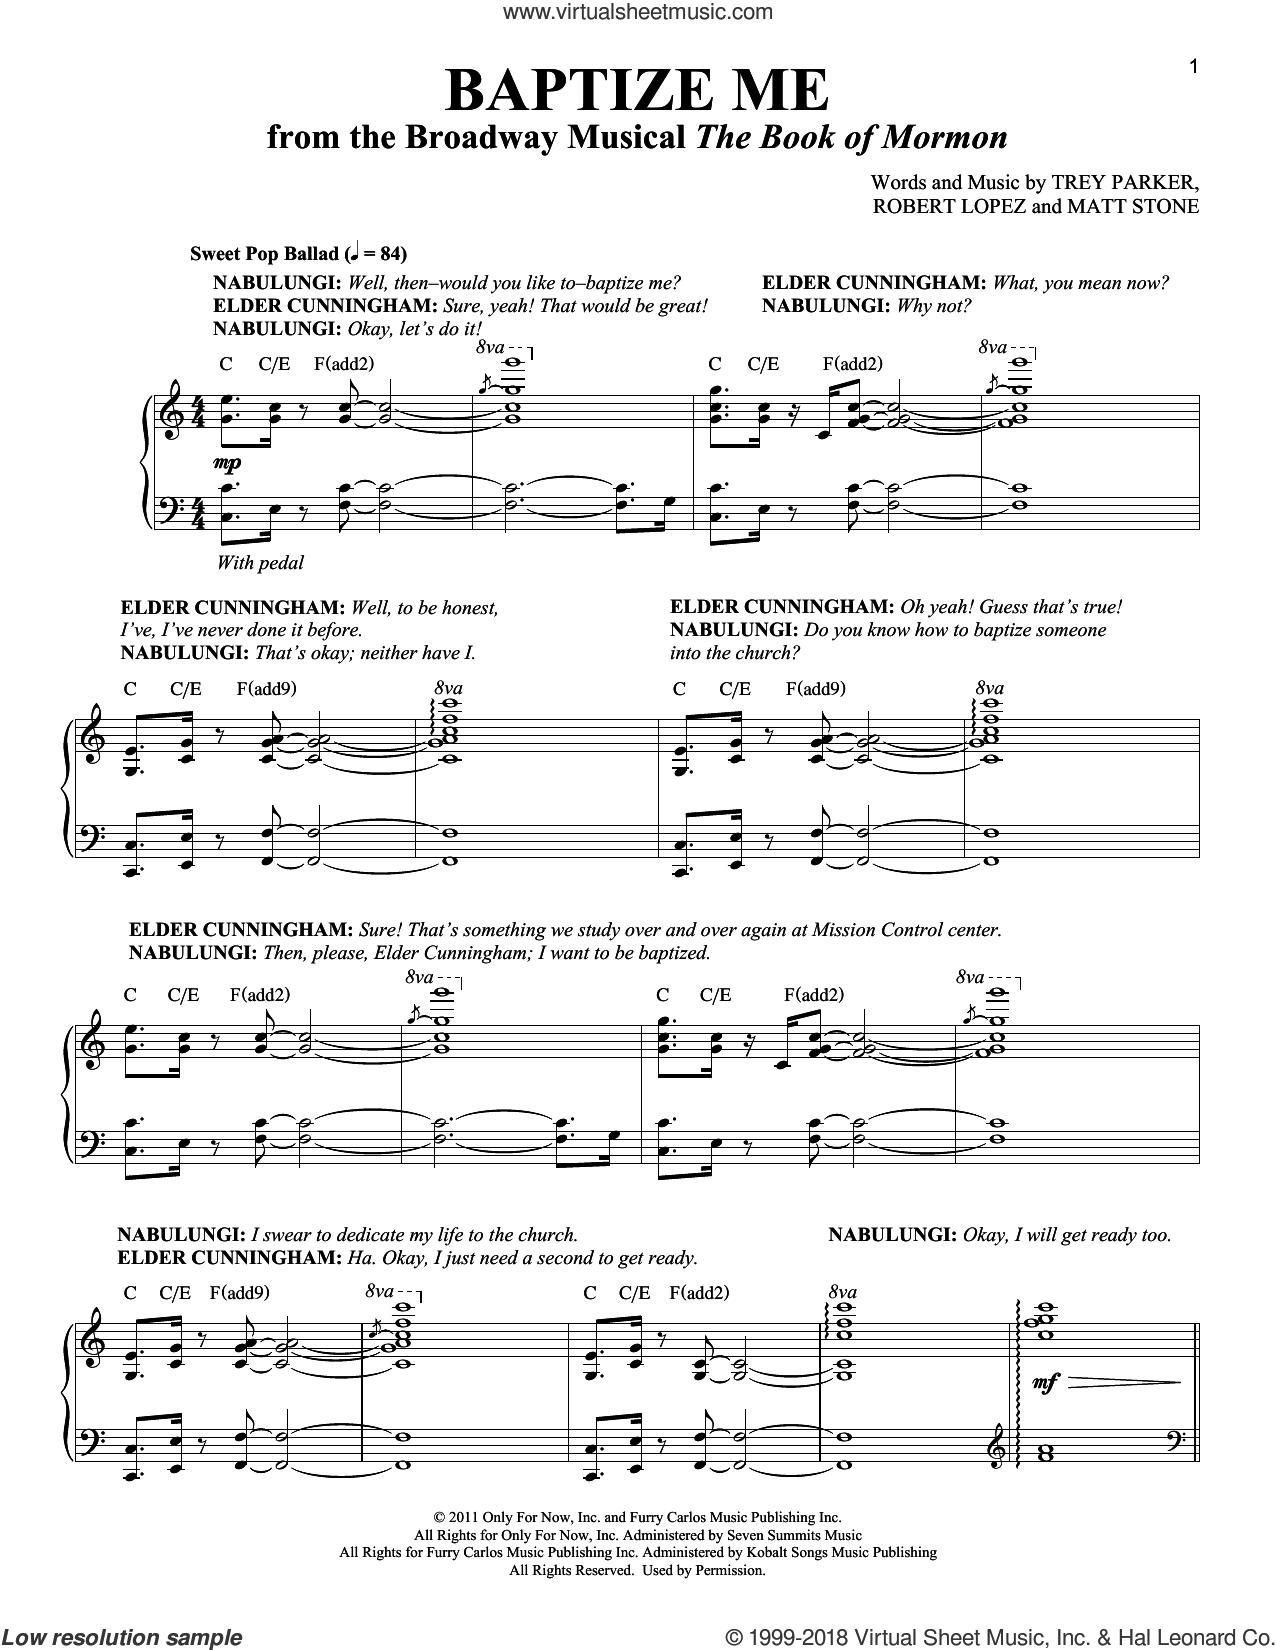 Baptize Me sheet music for voice and piano by Trey Parker & Matt Stone, Richard Walters, Matthew Stone, Robert Lopez and Trey Parker, intermediate skill level